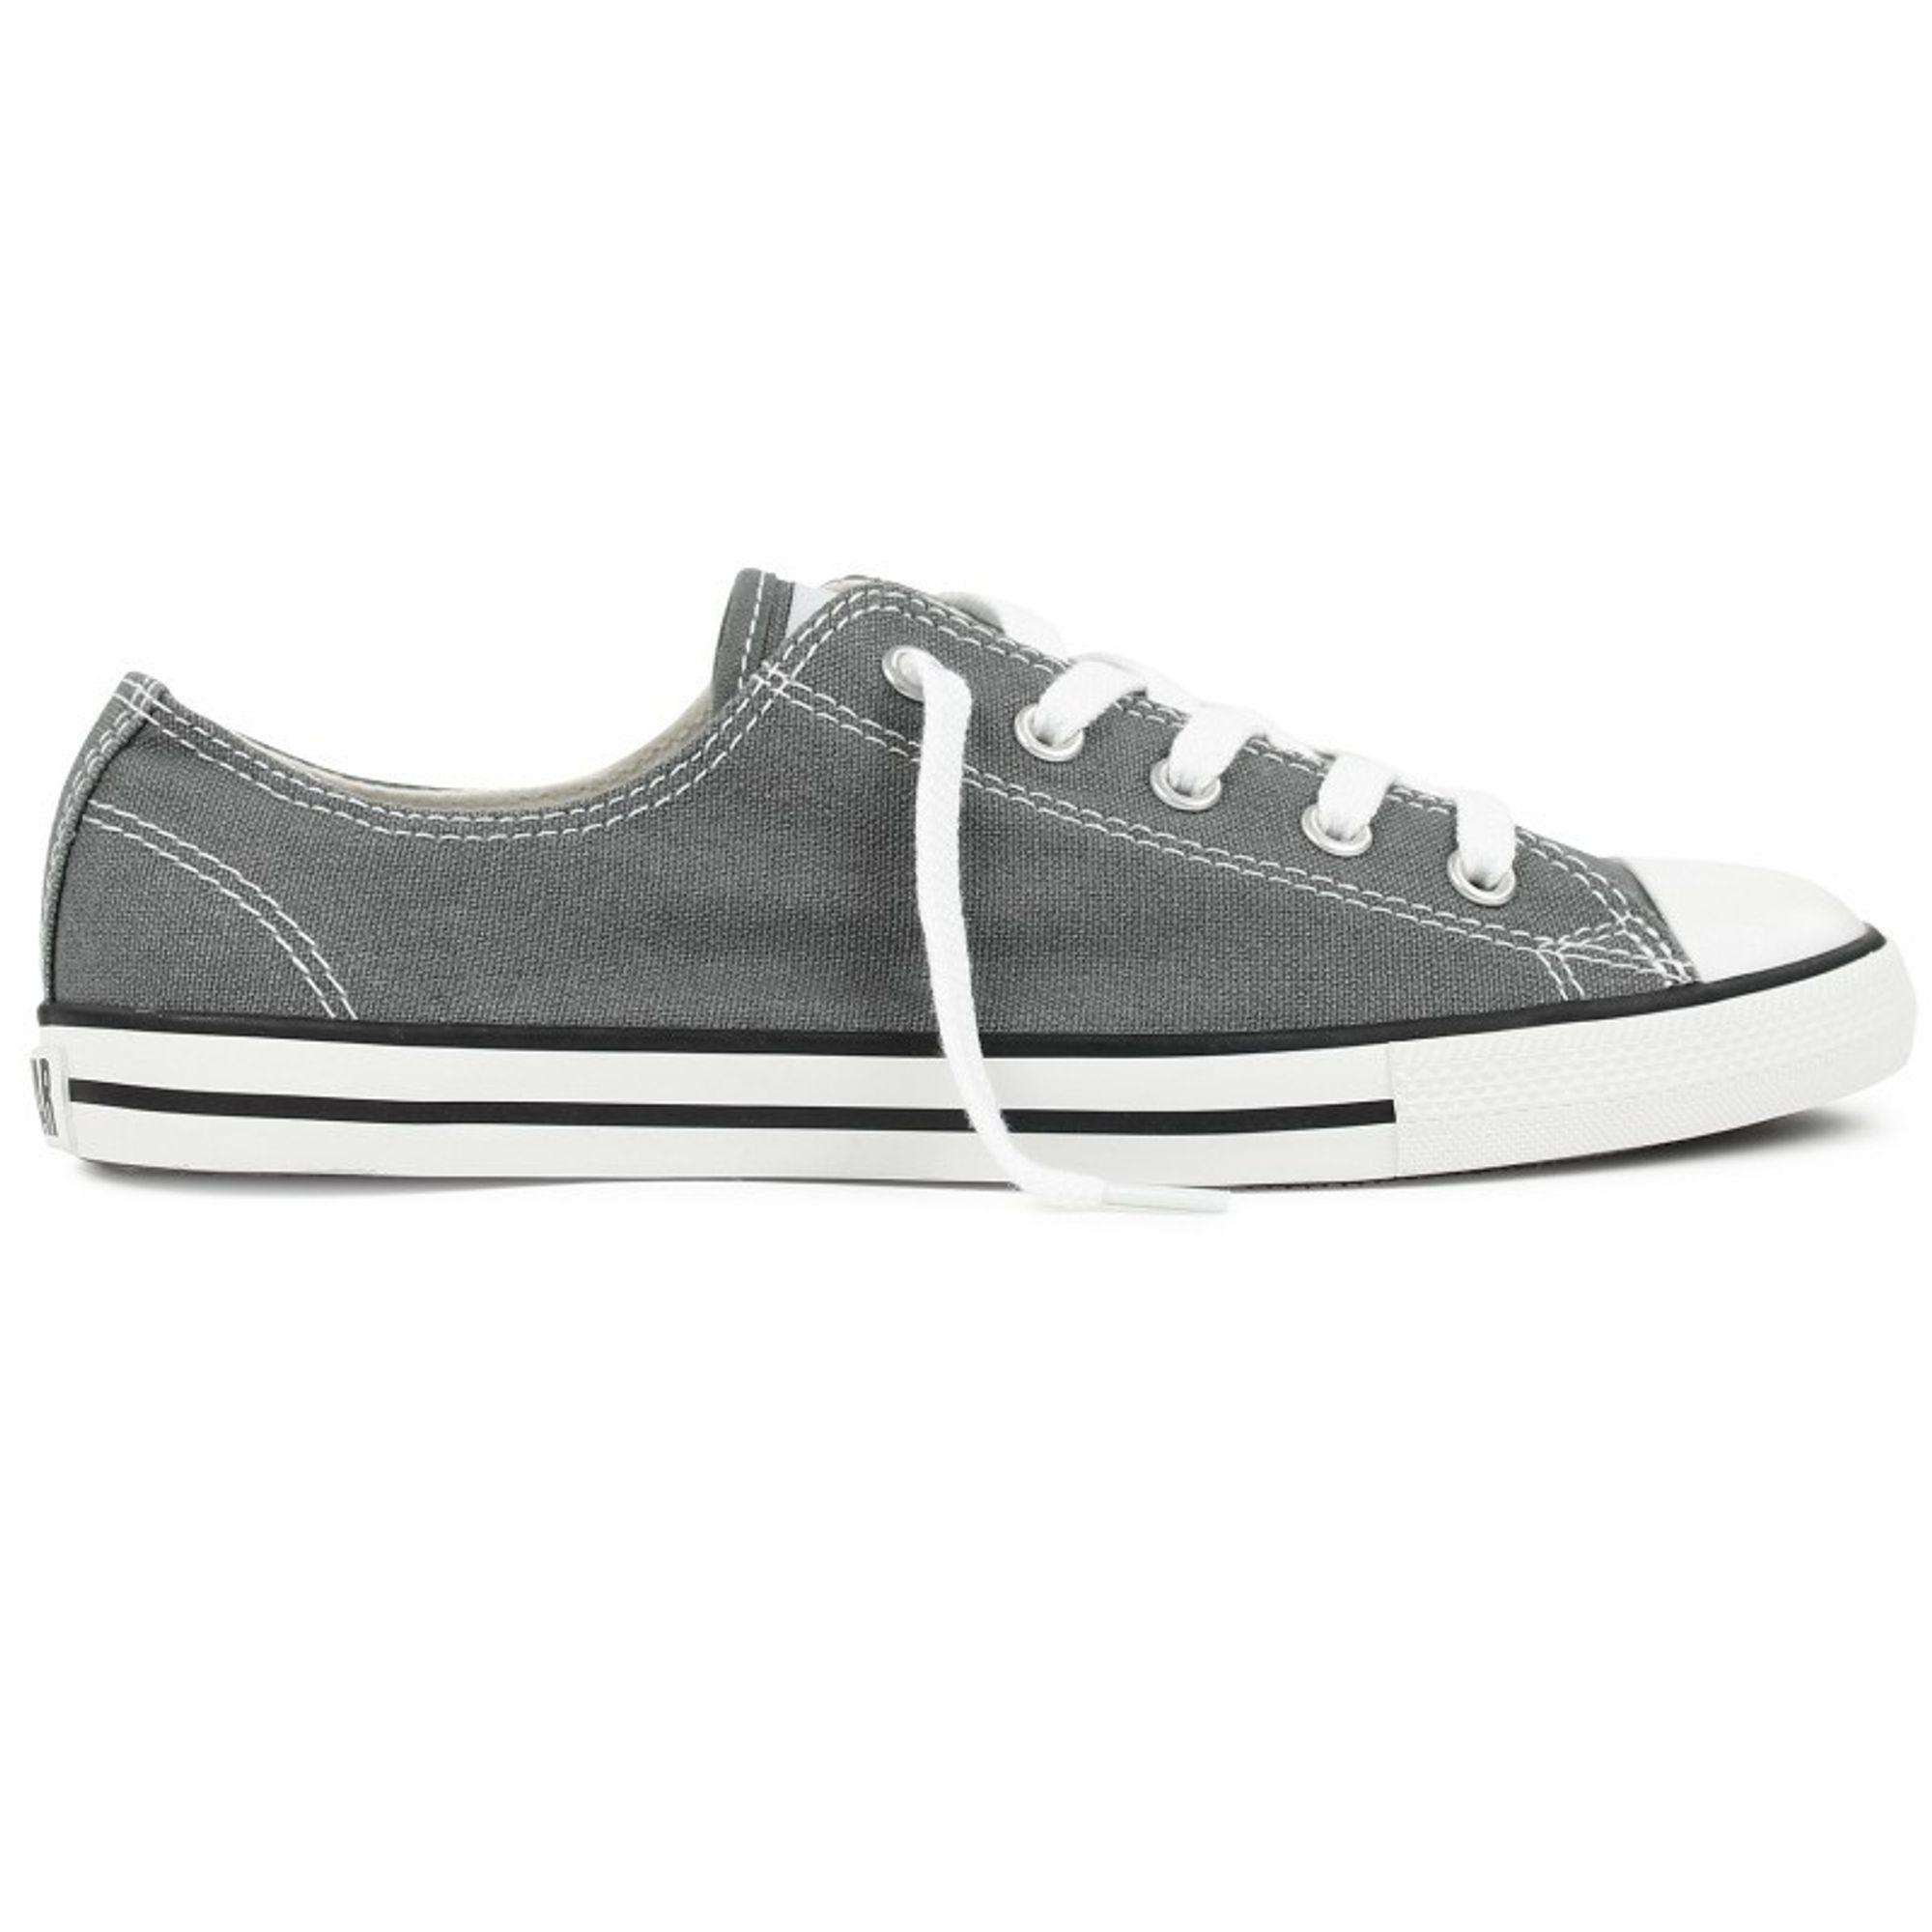 converse damen schuhe ct dainty ox grau 532353c sneakers. Black Bedroom Furniture Sets. Home Design Ideas